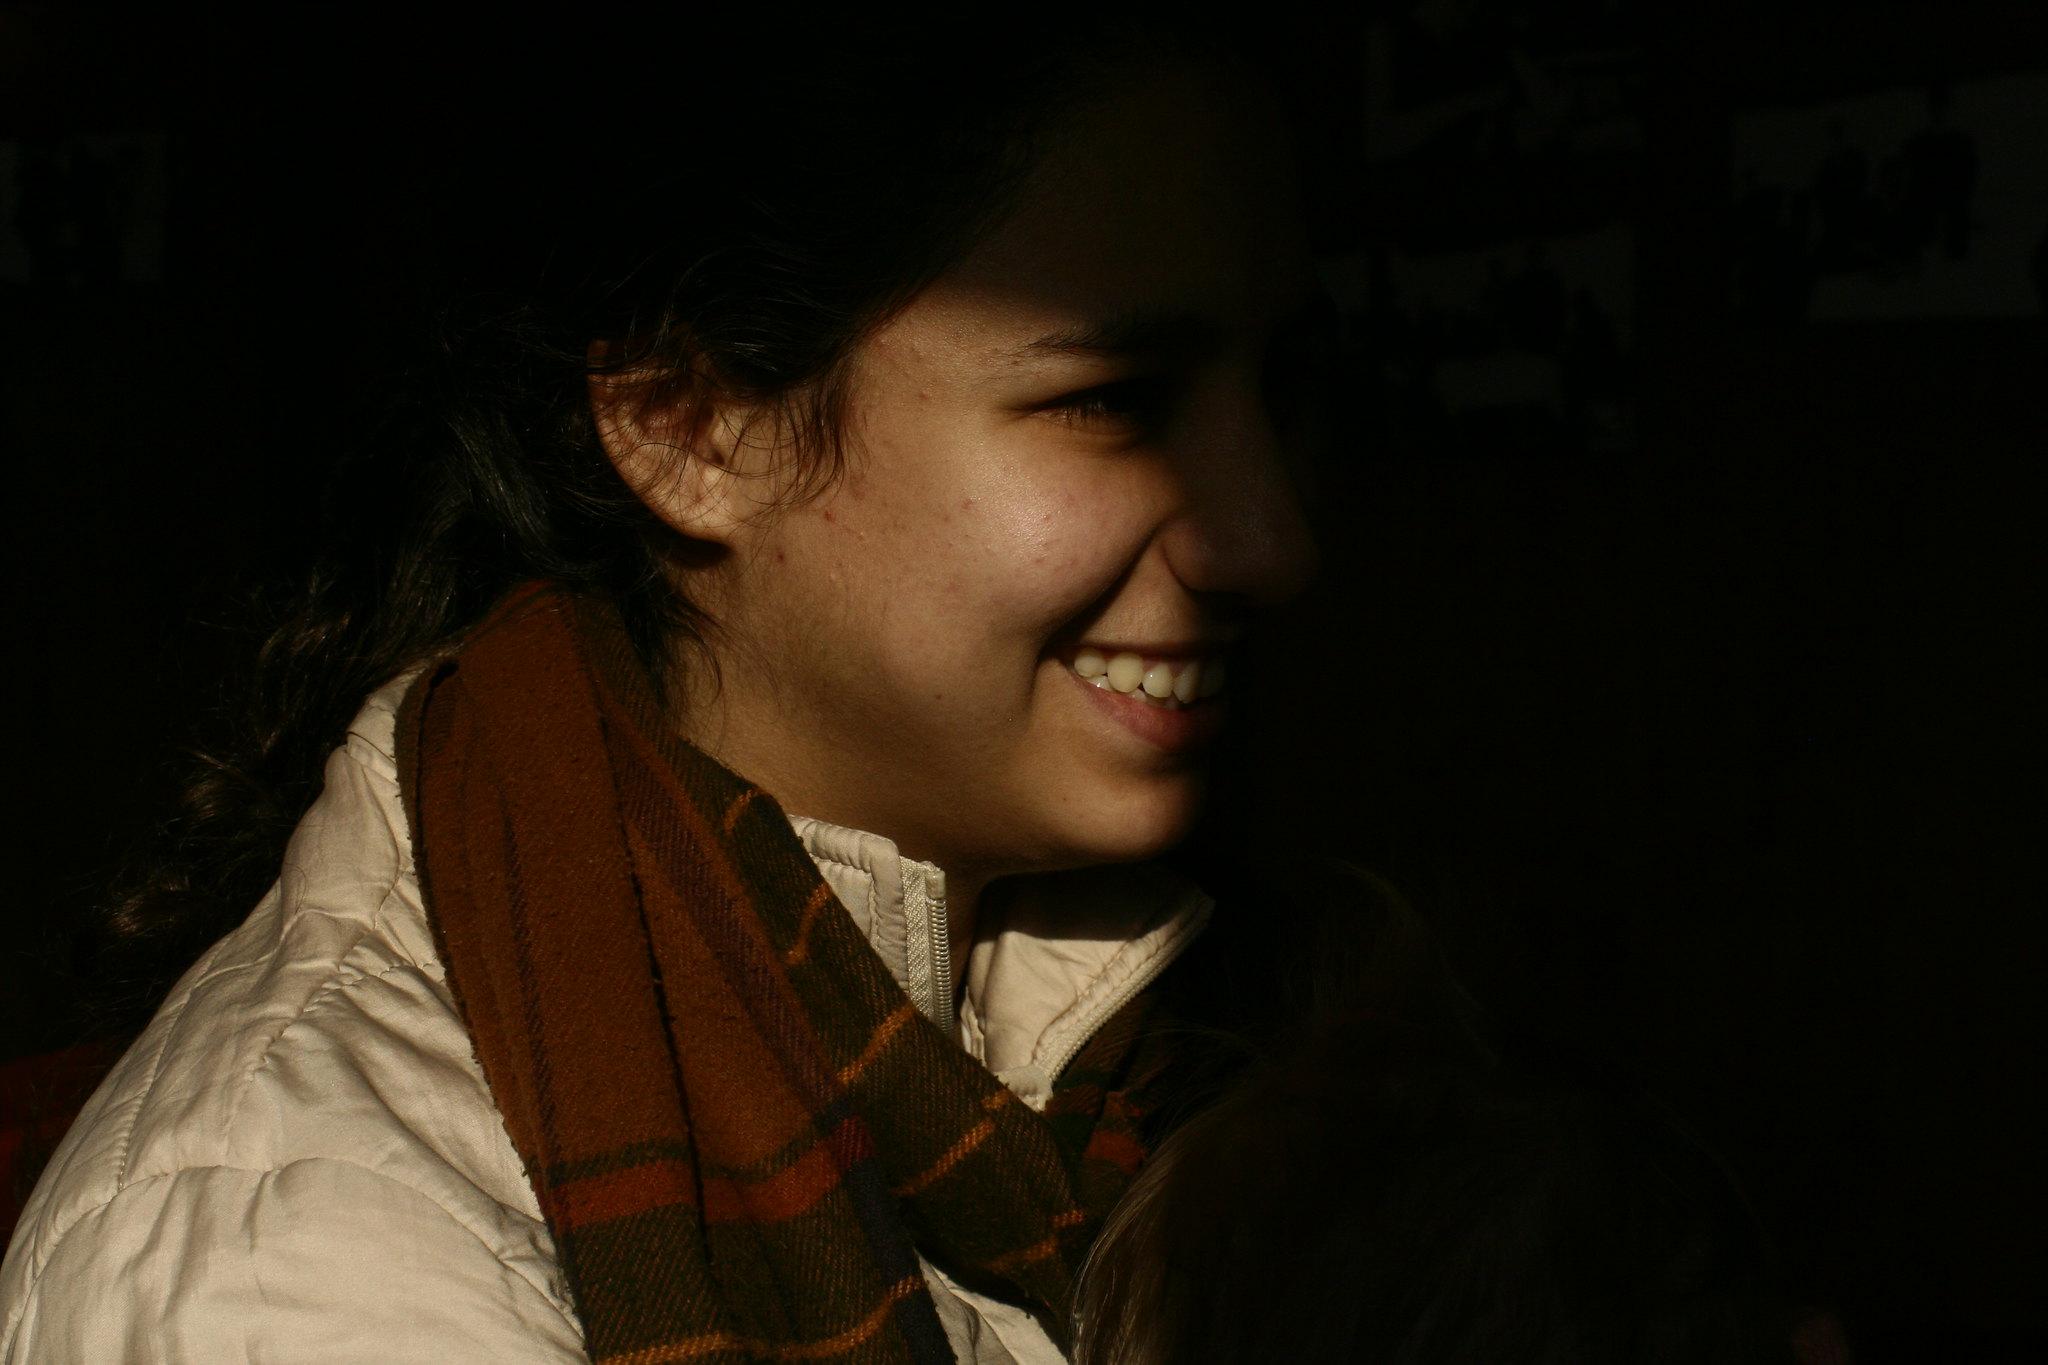 Sunlit smile.